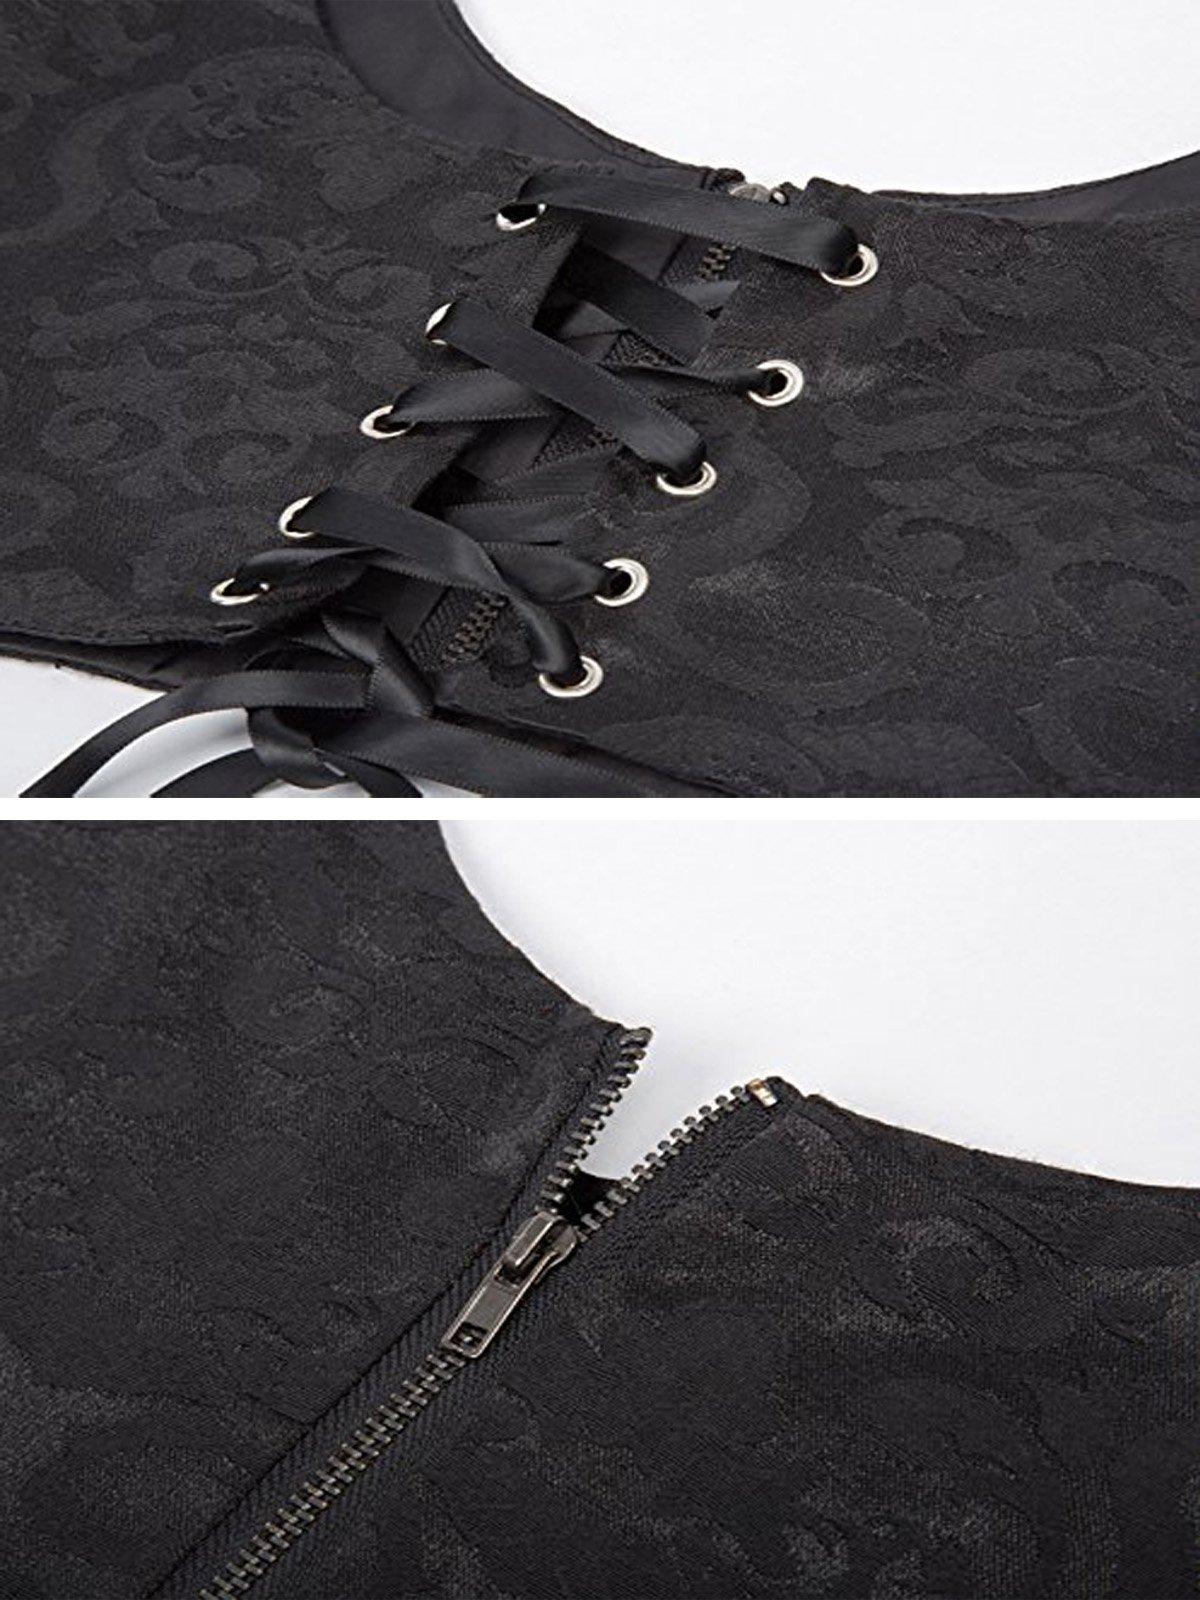 Elastic Wide Waist Lace-Up Belt Tied Corset Cinch Belt CL616-1 S Black